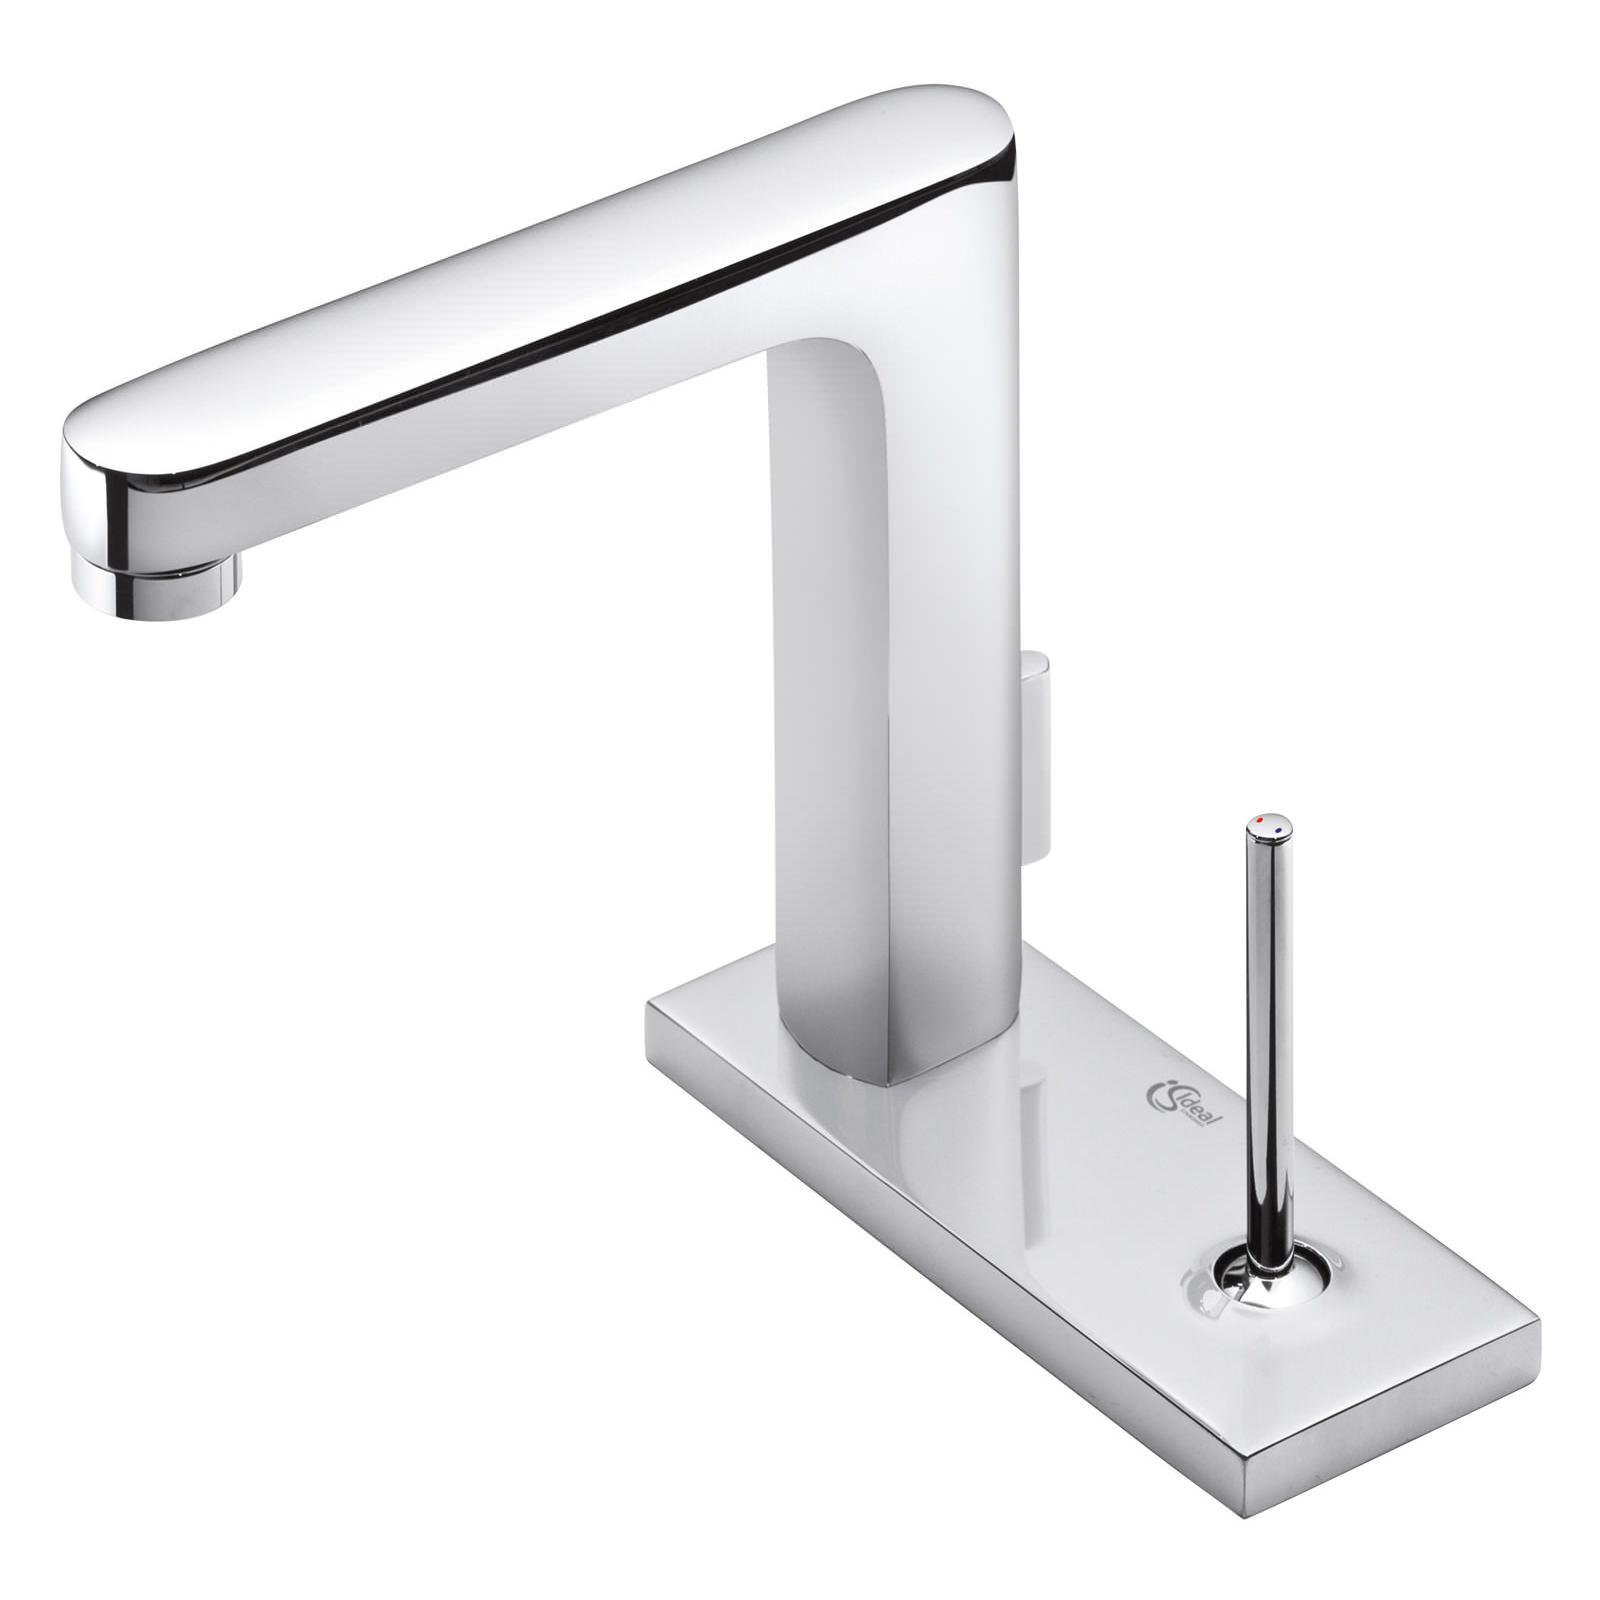 ideal standard simplyu 2 hole rectangular spout basin mixer tap. Black Bedroom Furniture Sets. Home Design Ideas